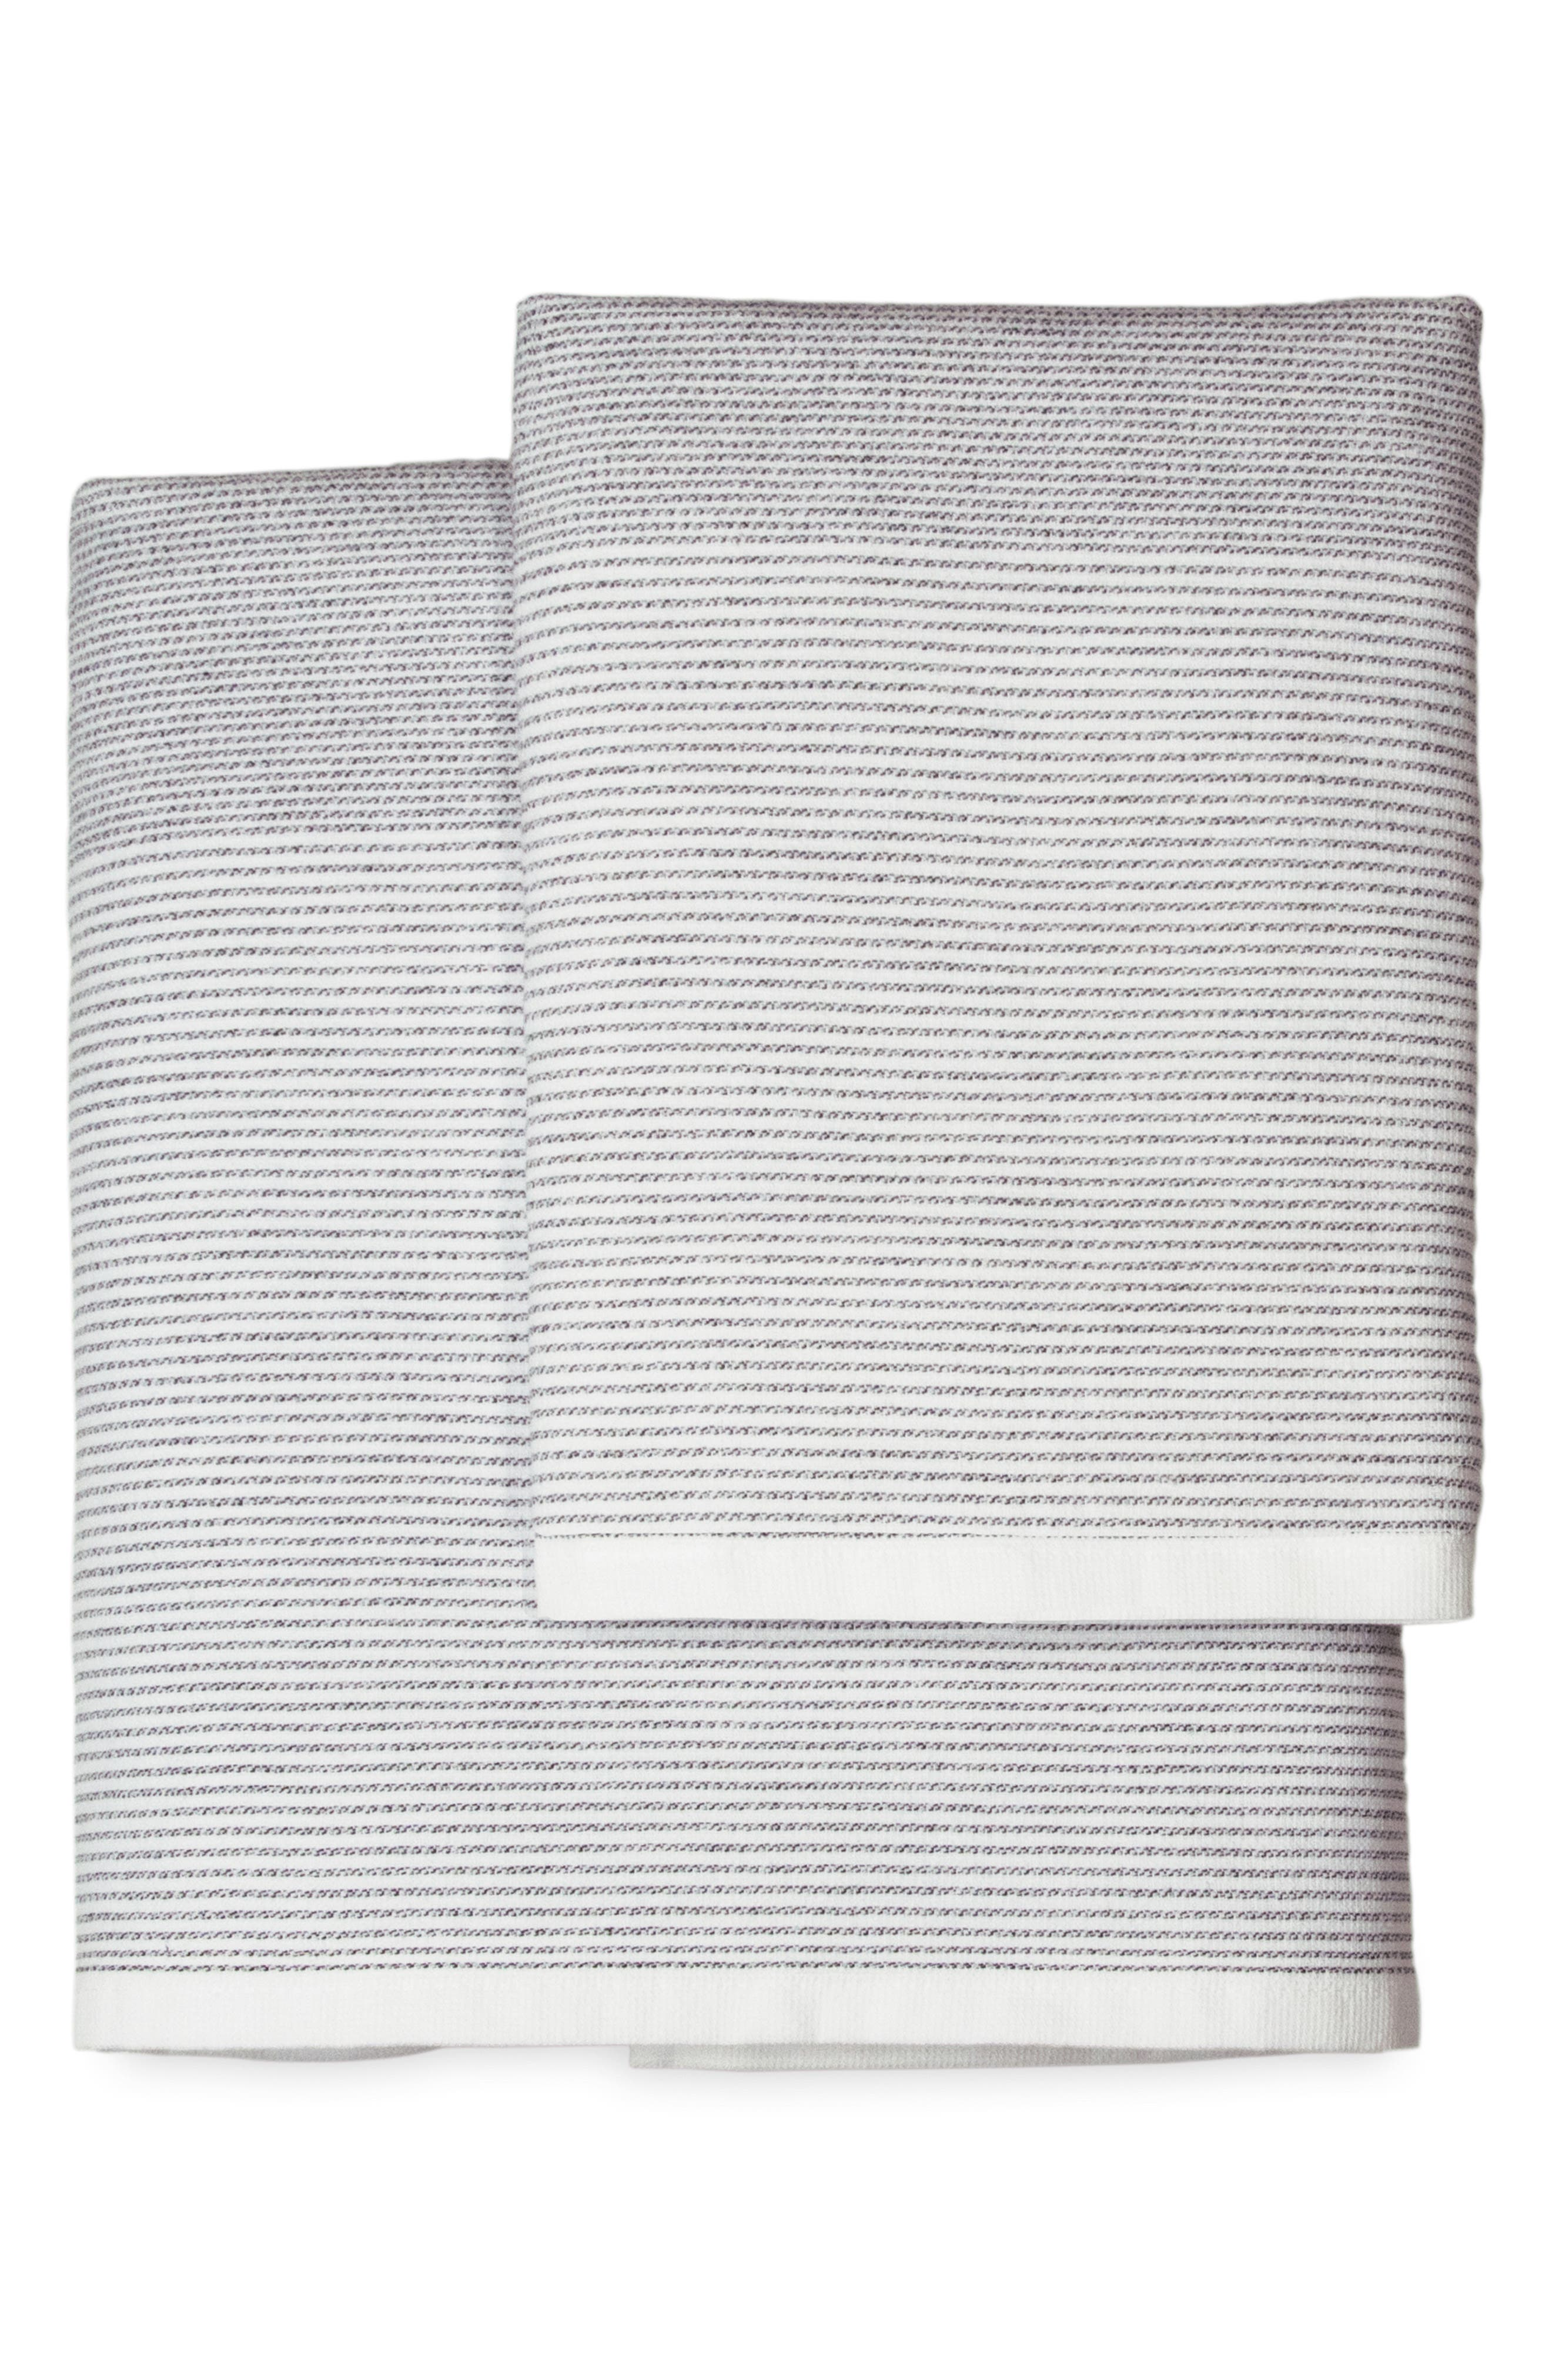 DKNY PURE Stripe Hand Towel, Main, color, WHITE/ BLACK